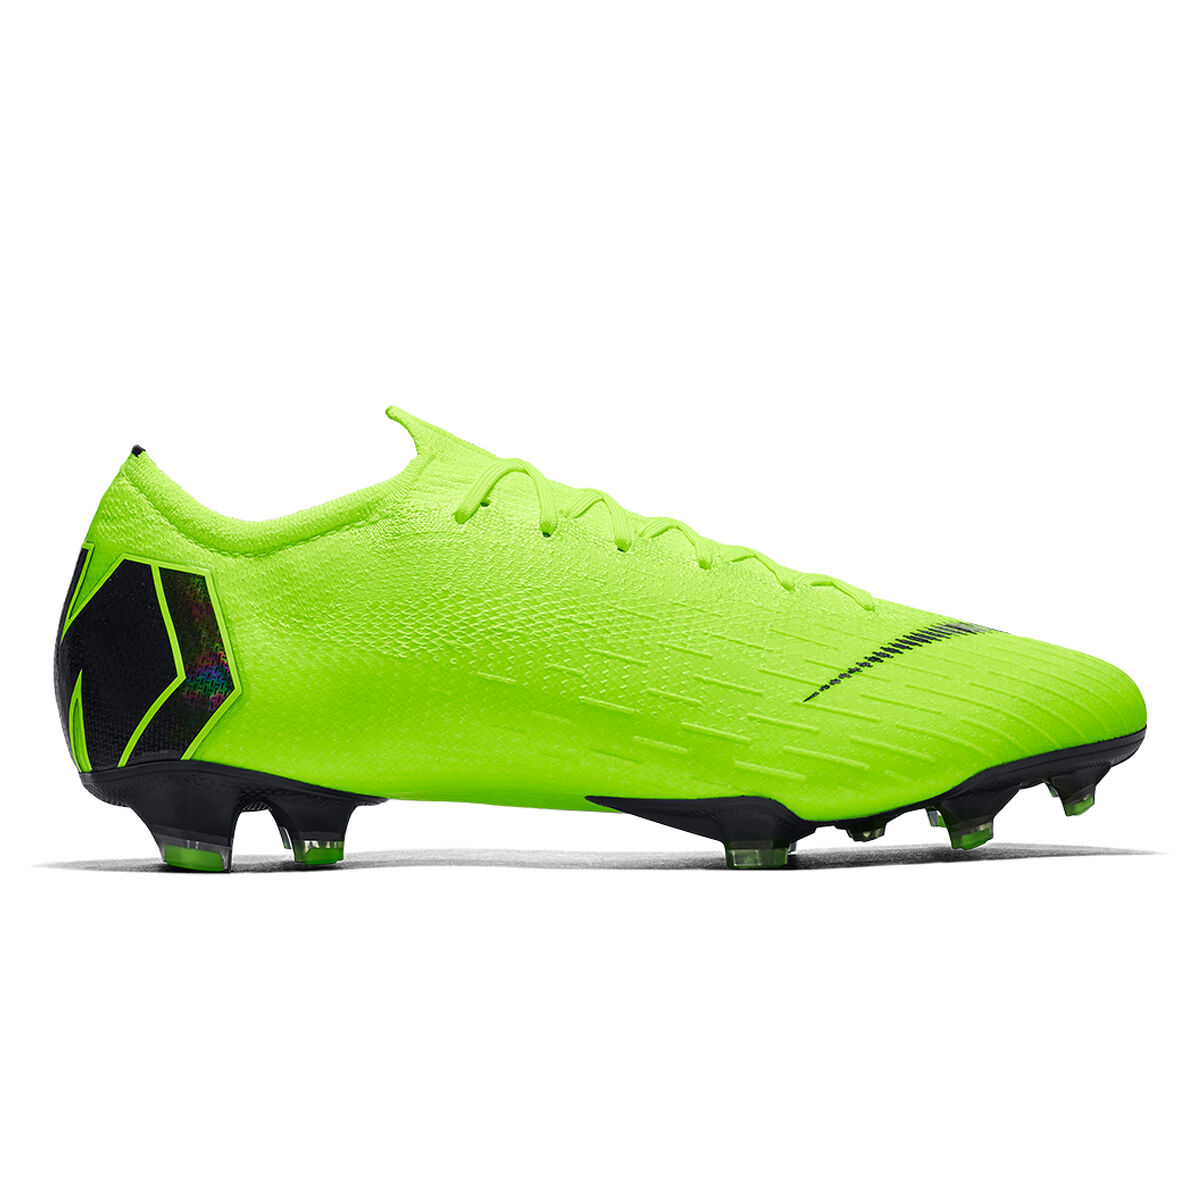 Xii Vapor Mercurial Mens Nike Boots Elite Football lKcF13TJ